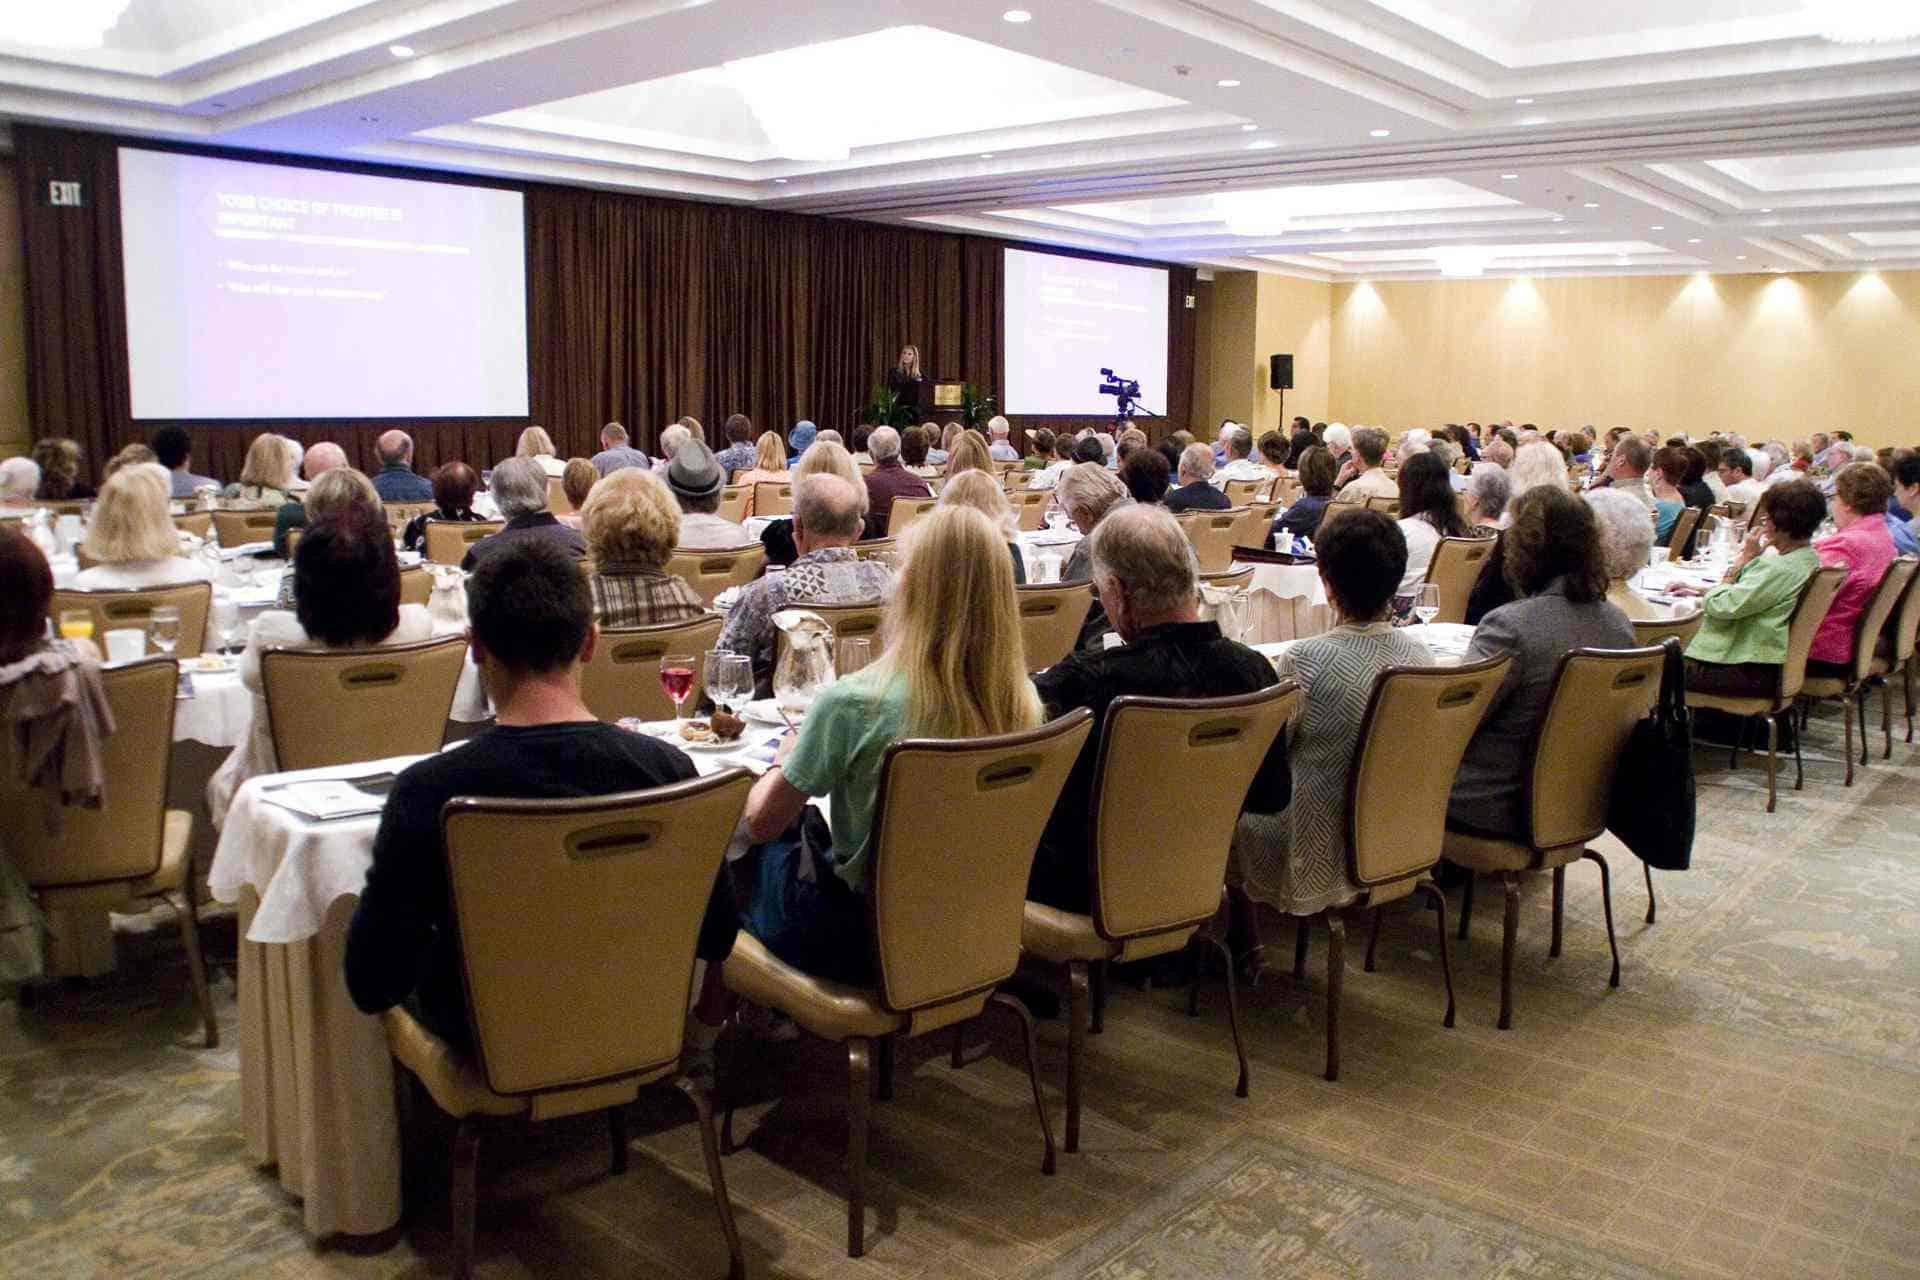 31verdon 7 Newport Beach Estate Planning Conference